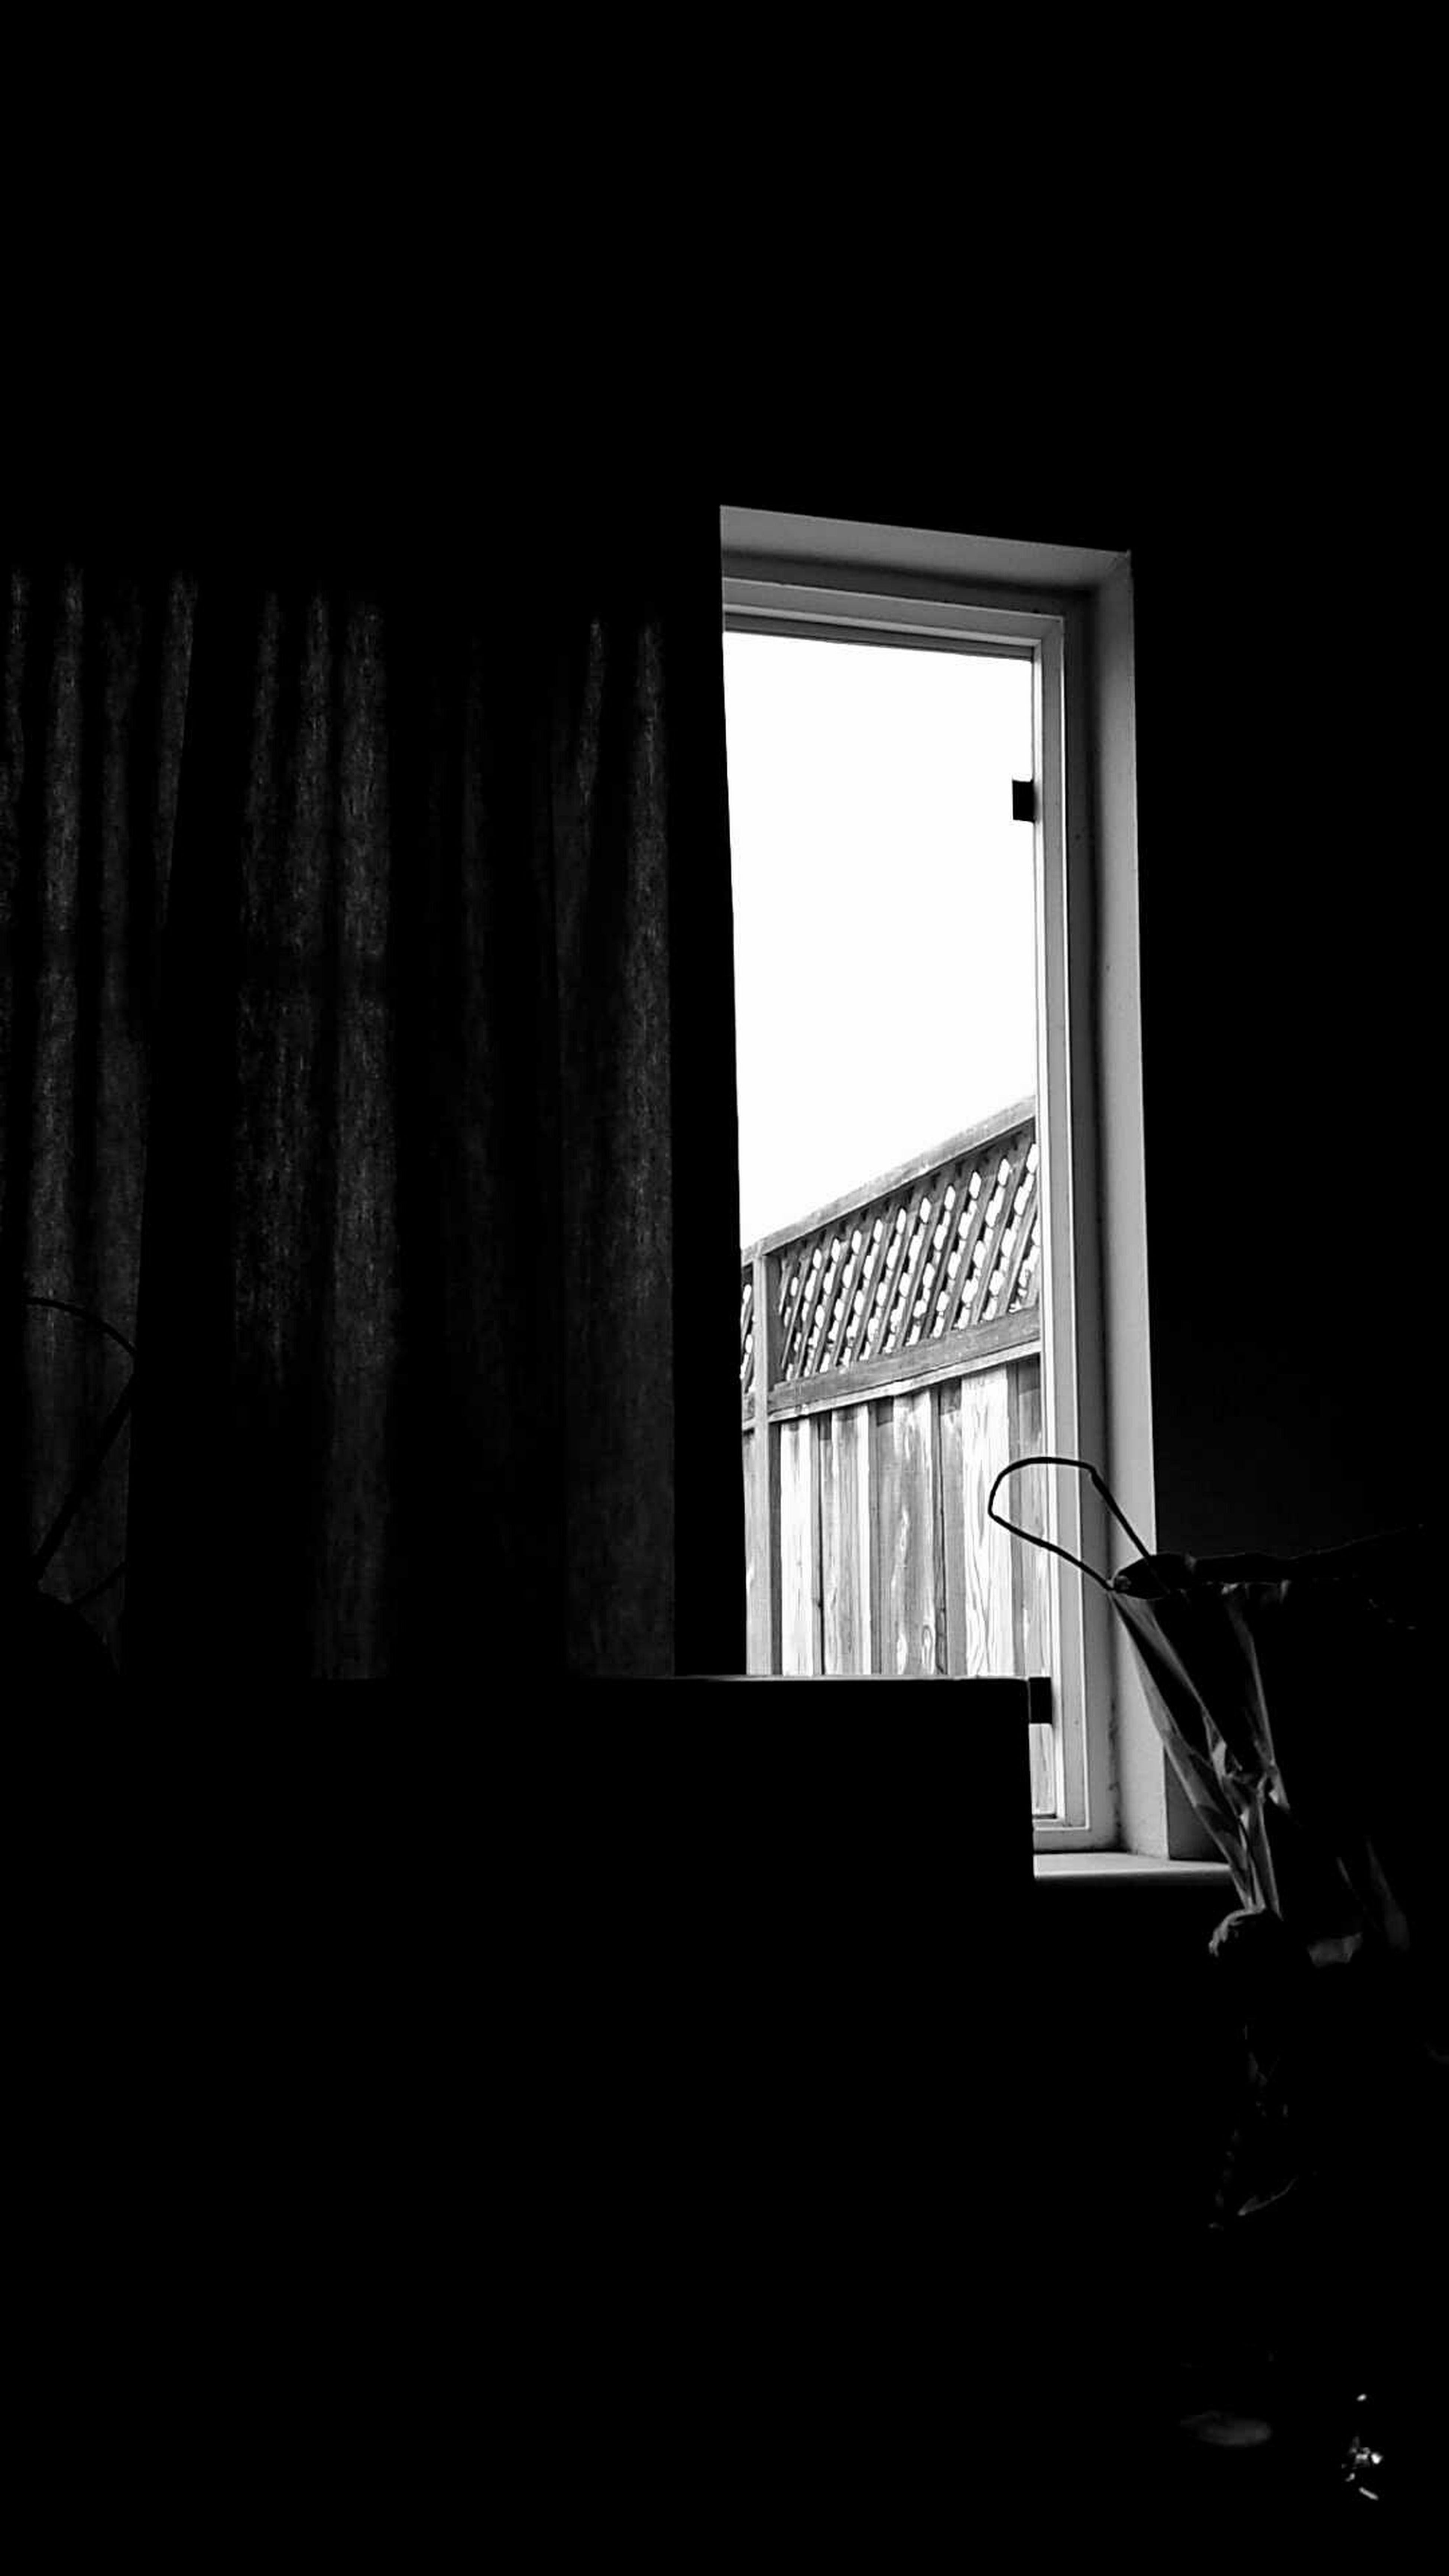 Window Hotoutside Inside Room Ihatethisheat